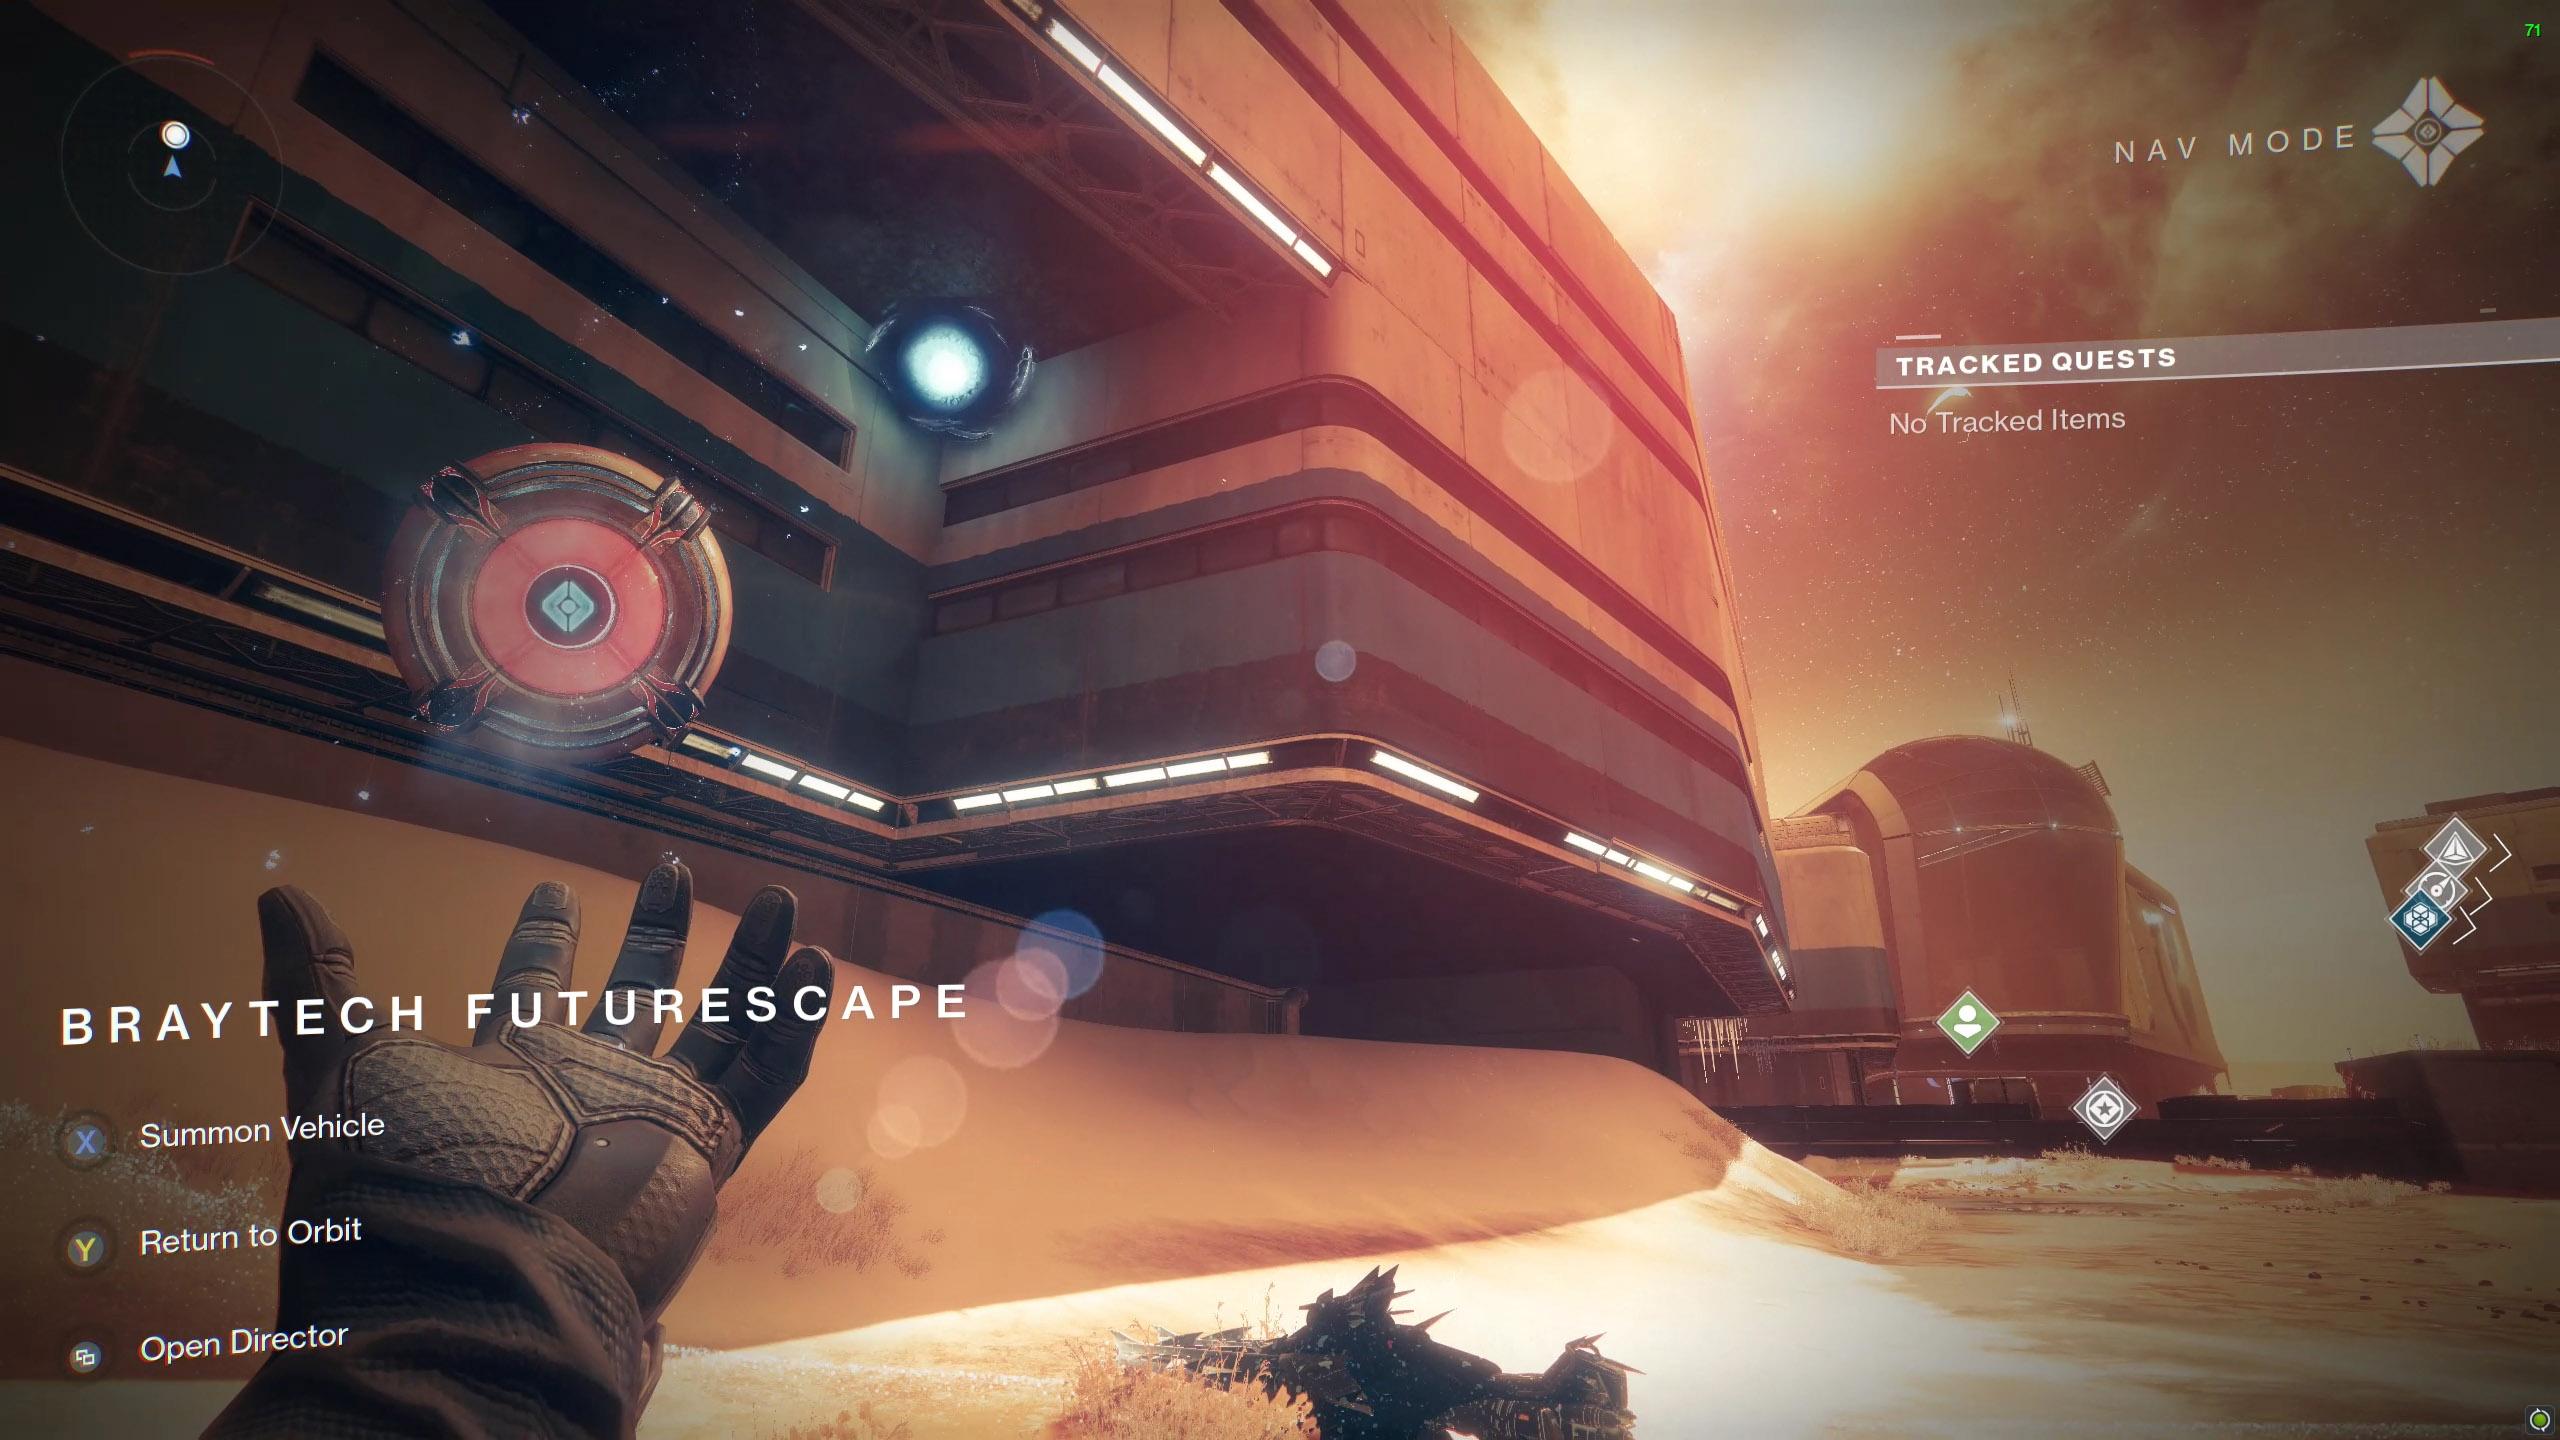 Destiny 2 Savathuns Eyes Mars Braytech Futurescape 1